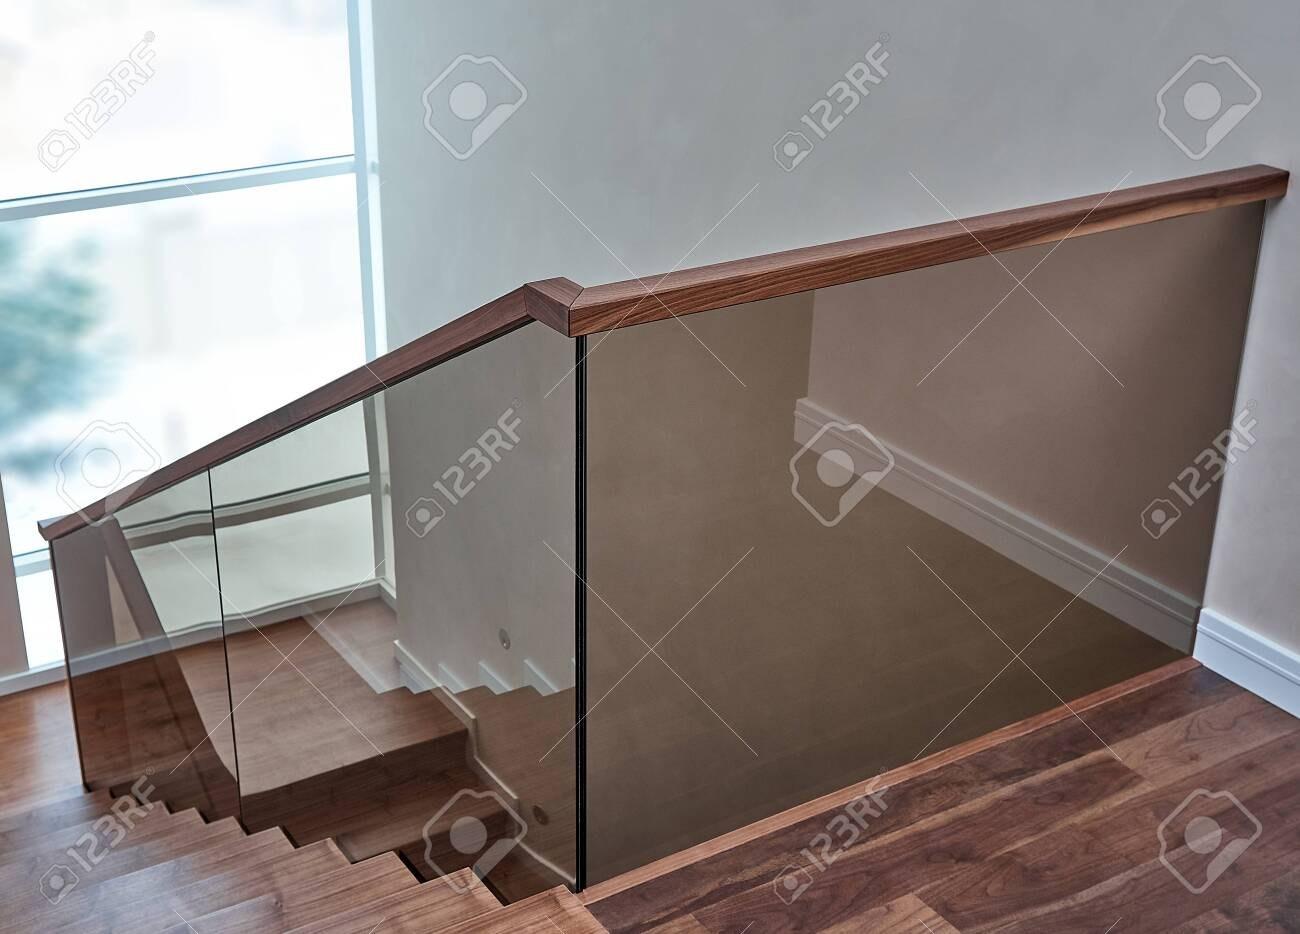 Beautiful Modern Glass Railing For Wooden Staircase With Wooden | Glass Railing With Wood Handrail | Modern | Interior | Panel | Metal | Residential